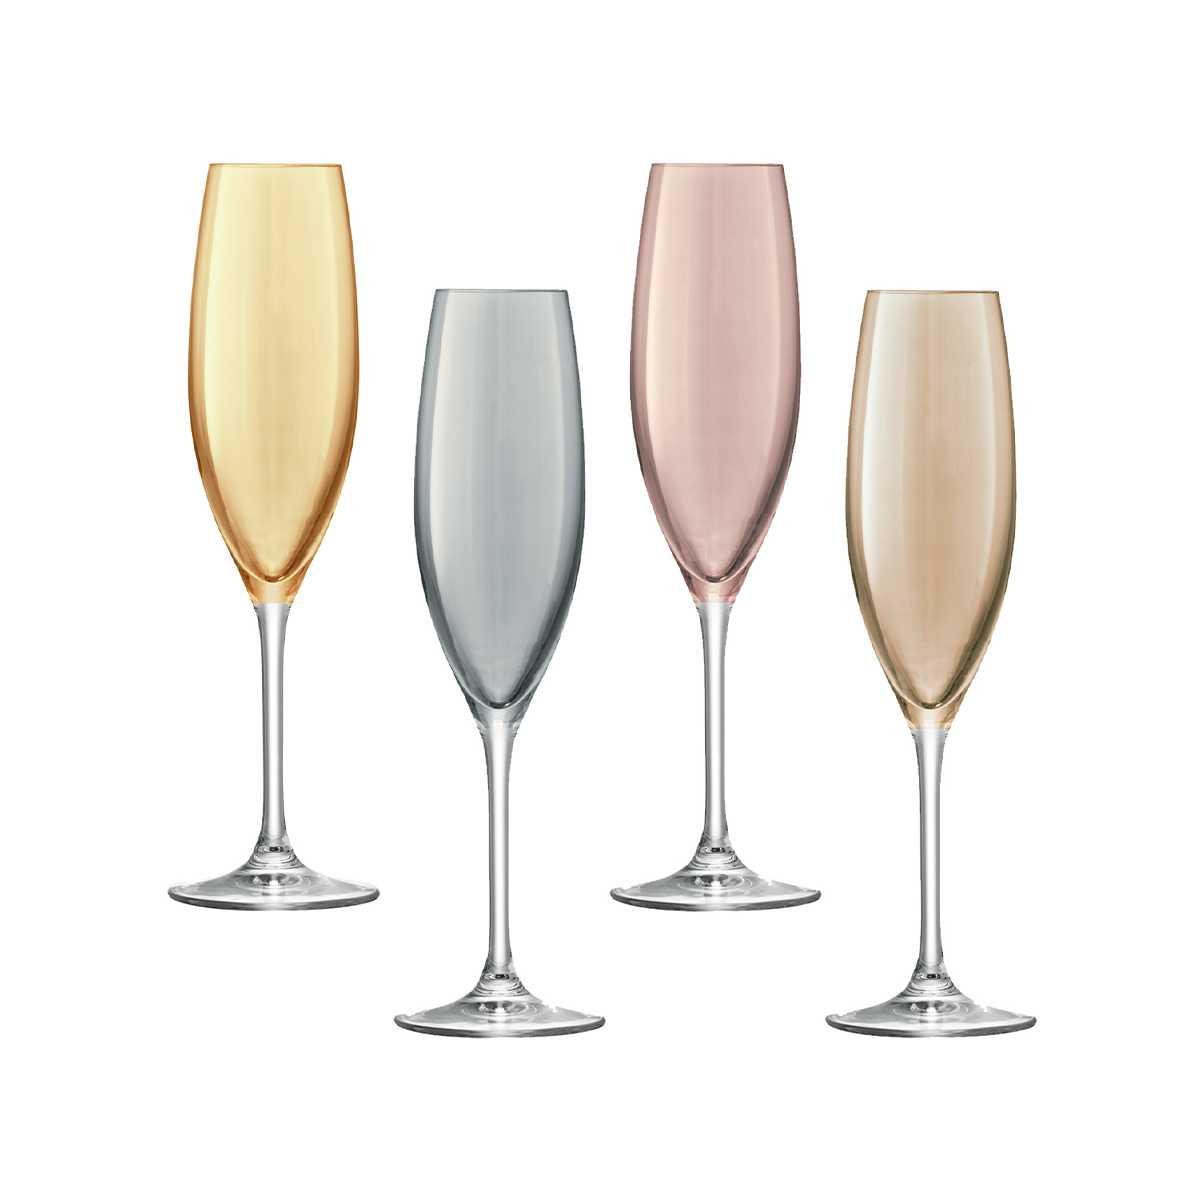 Онлайн каталог PROMENU: Набор бокалов для шампанского 0,225, 4 шт LSA Polka  (G978-09-960) LSA G978-09-960